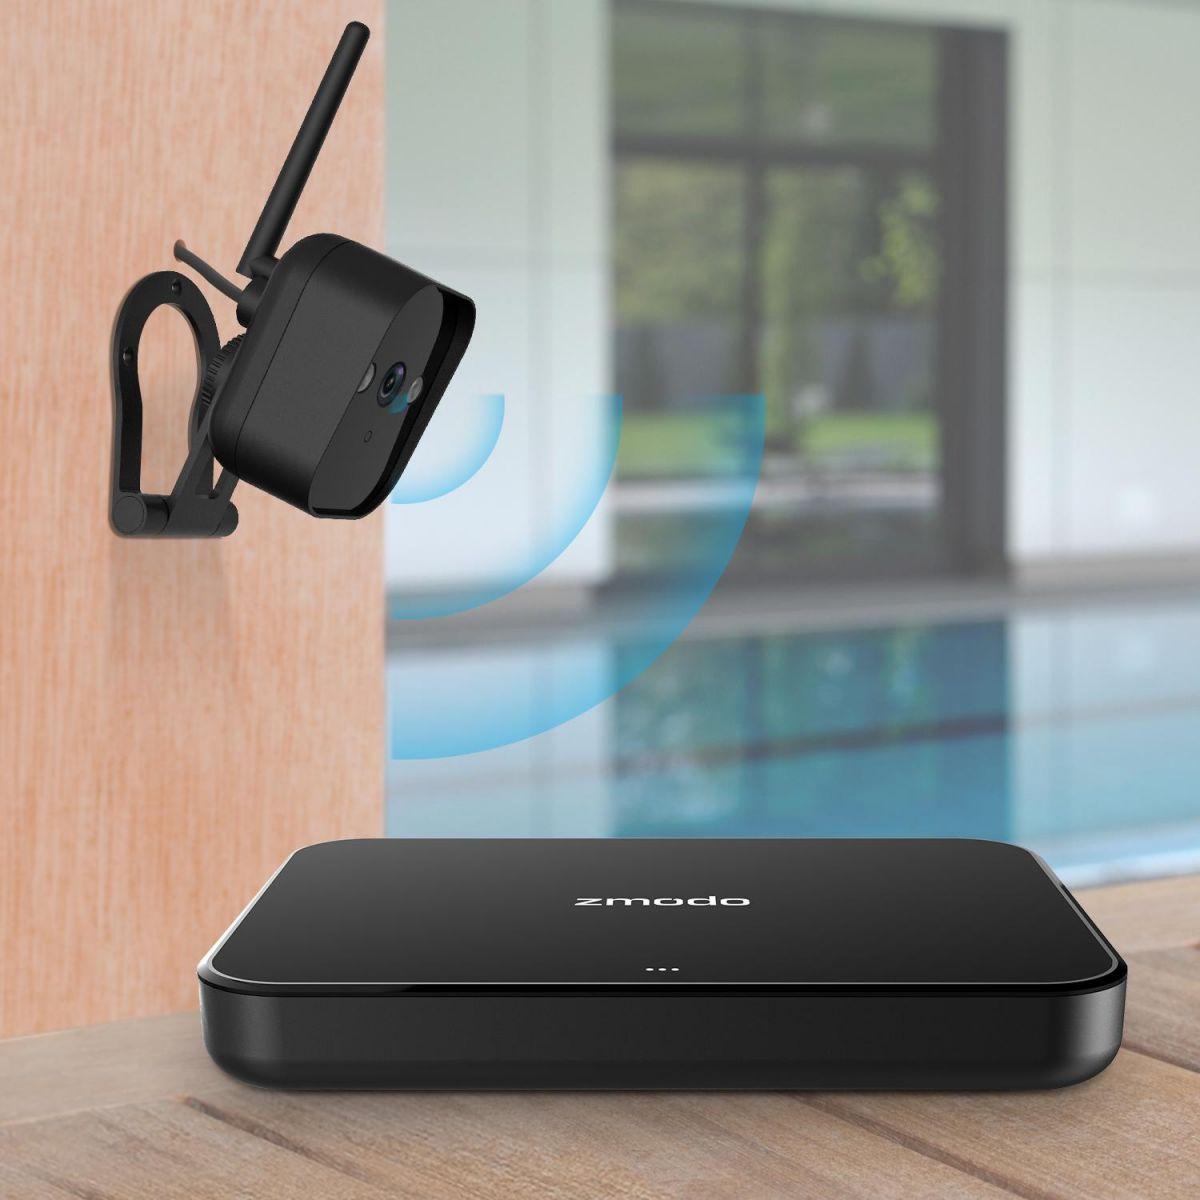 Комплект IP видеонаблюдения с 2 камерами ZMODO ZM-KW1001-O-500Gb